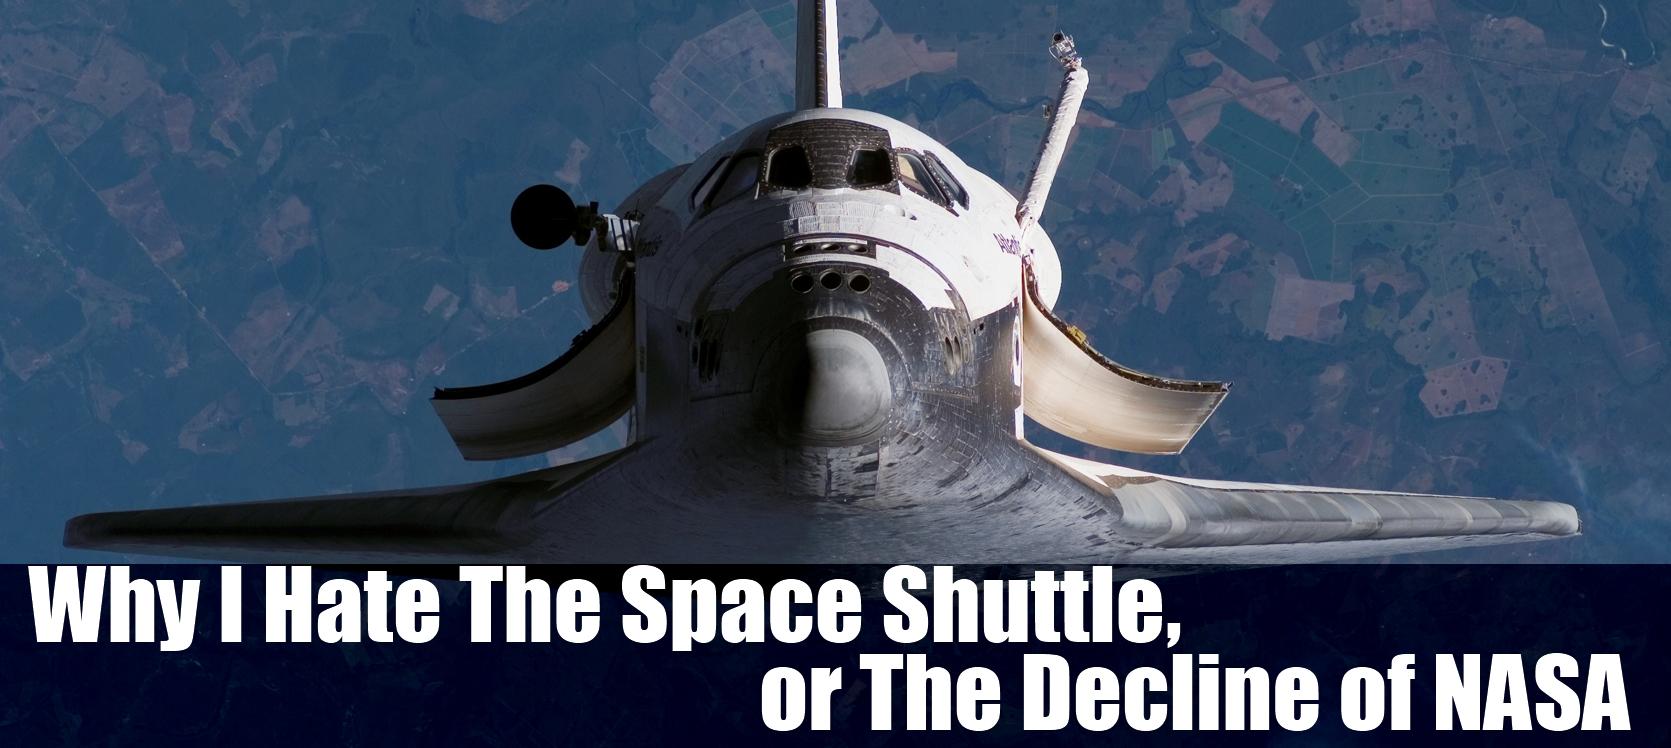 astronaut i hate - photo #10